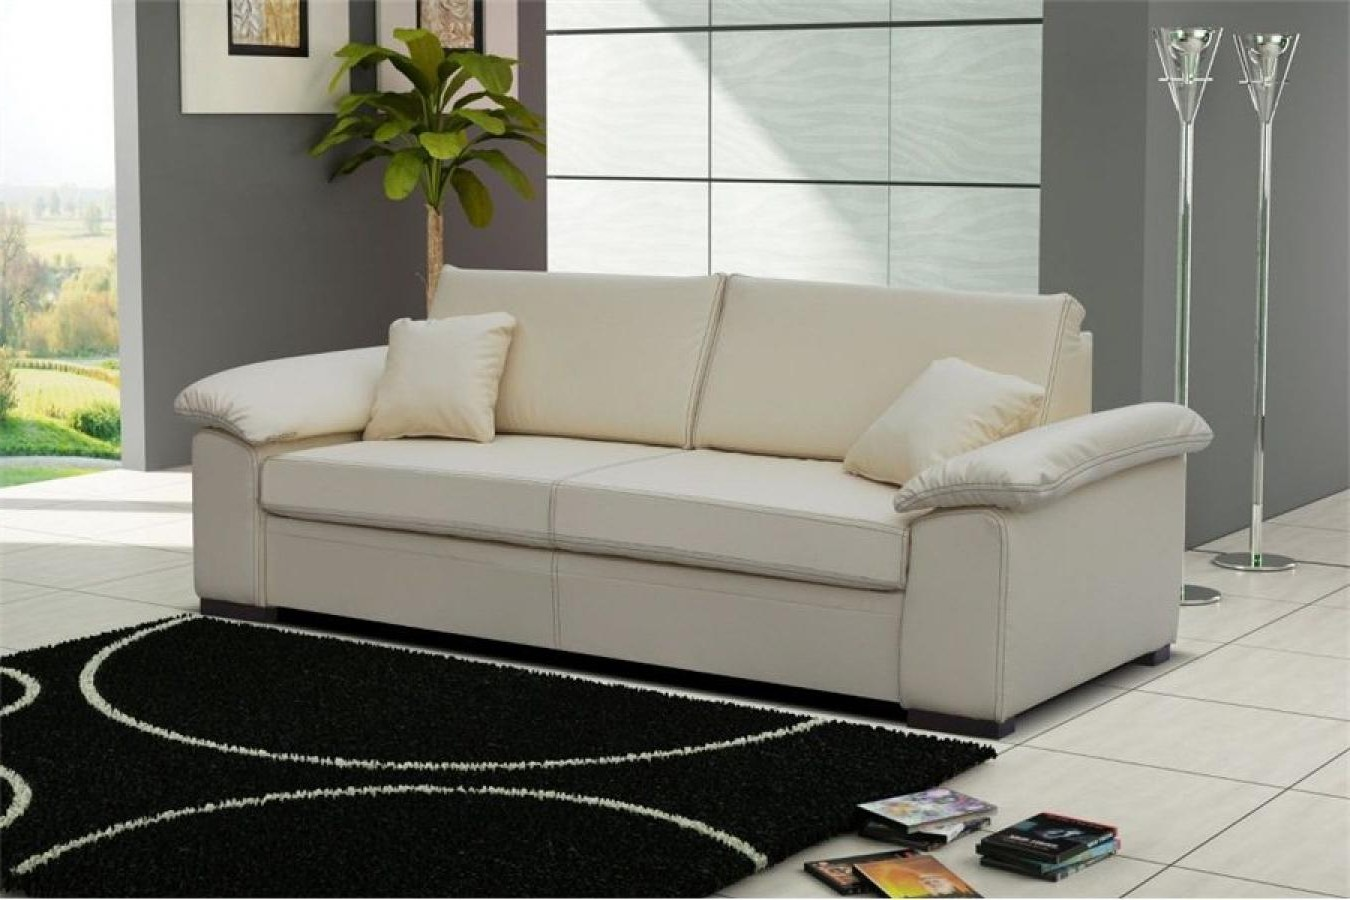 canape convertible lampolet ikea canap id es de d coration de maison lmb886ab53. Black Bedroom Furniture Sets. Home Design Ideas